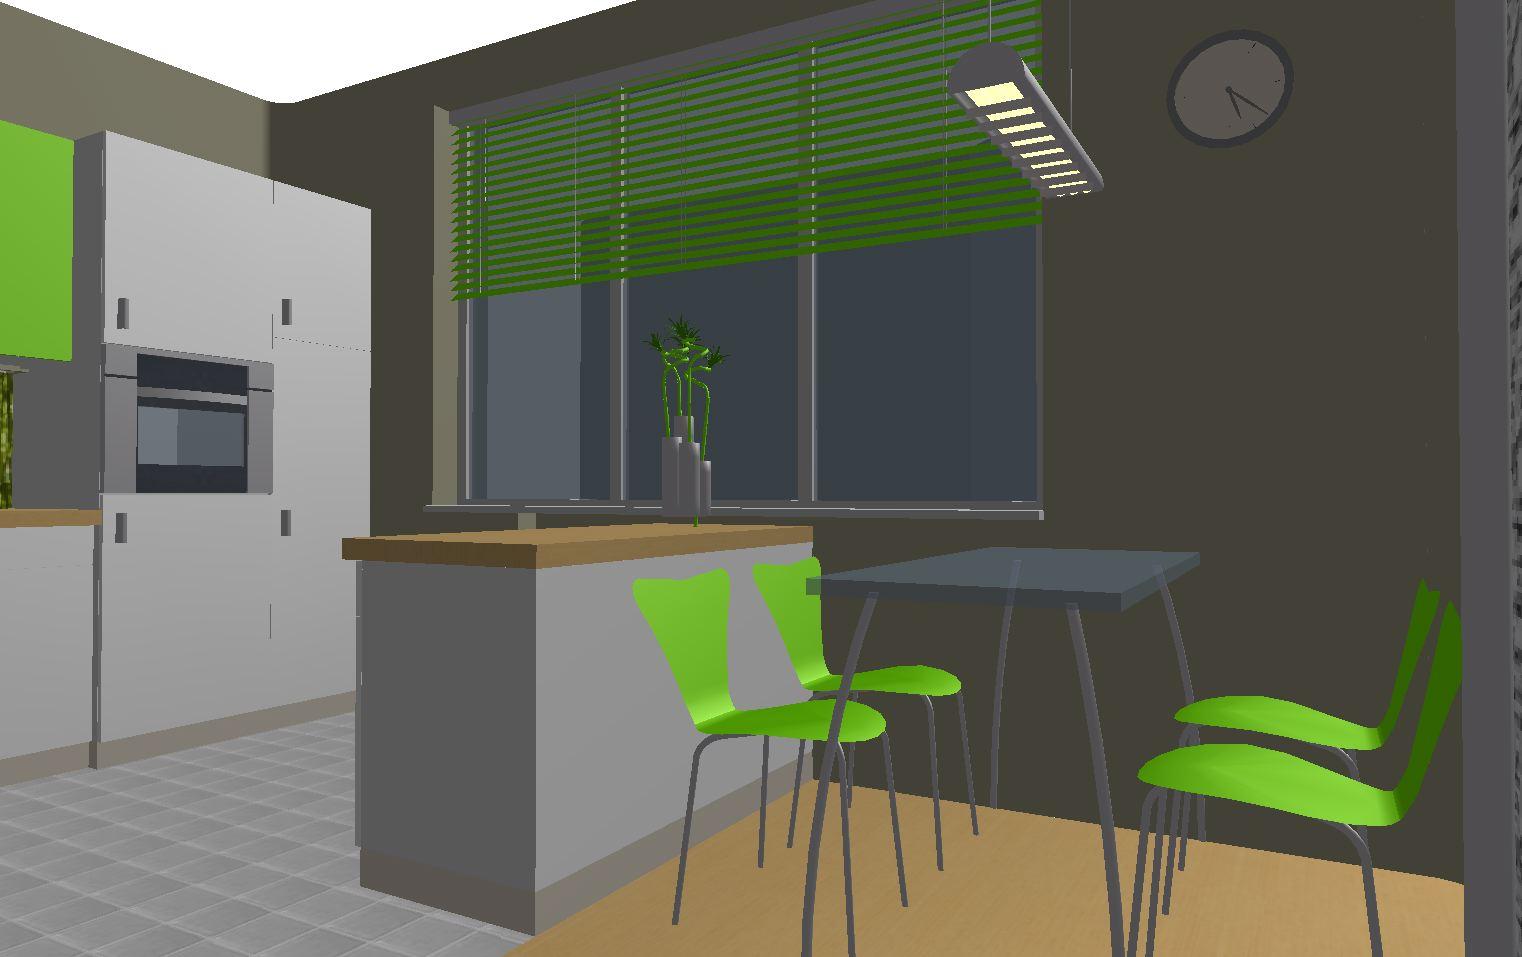 Architekt Pabianice OOO studio Architektura i Design portfolio projekt wnętrza kuchnia 2